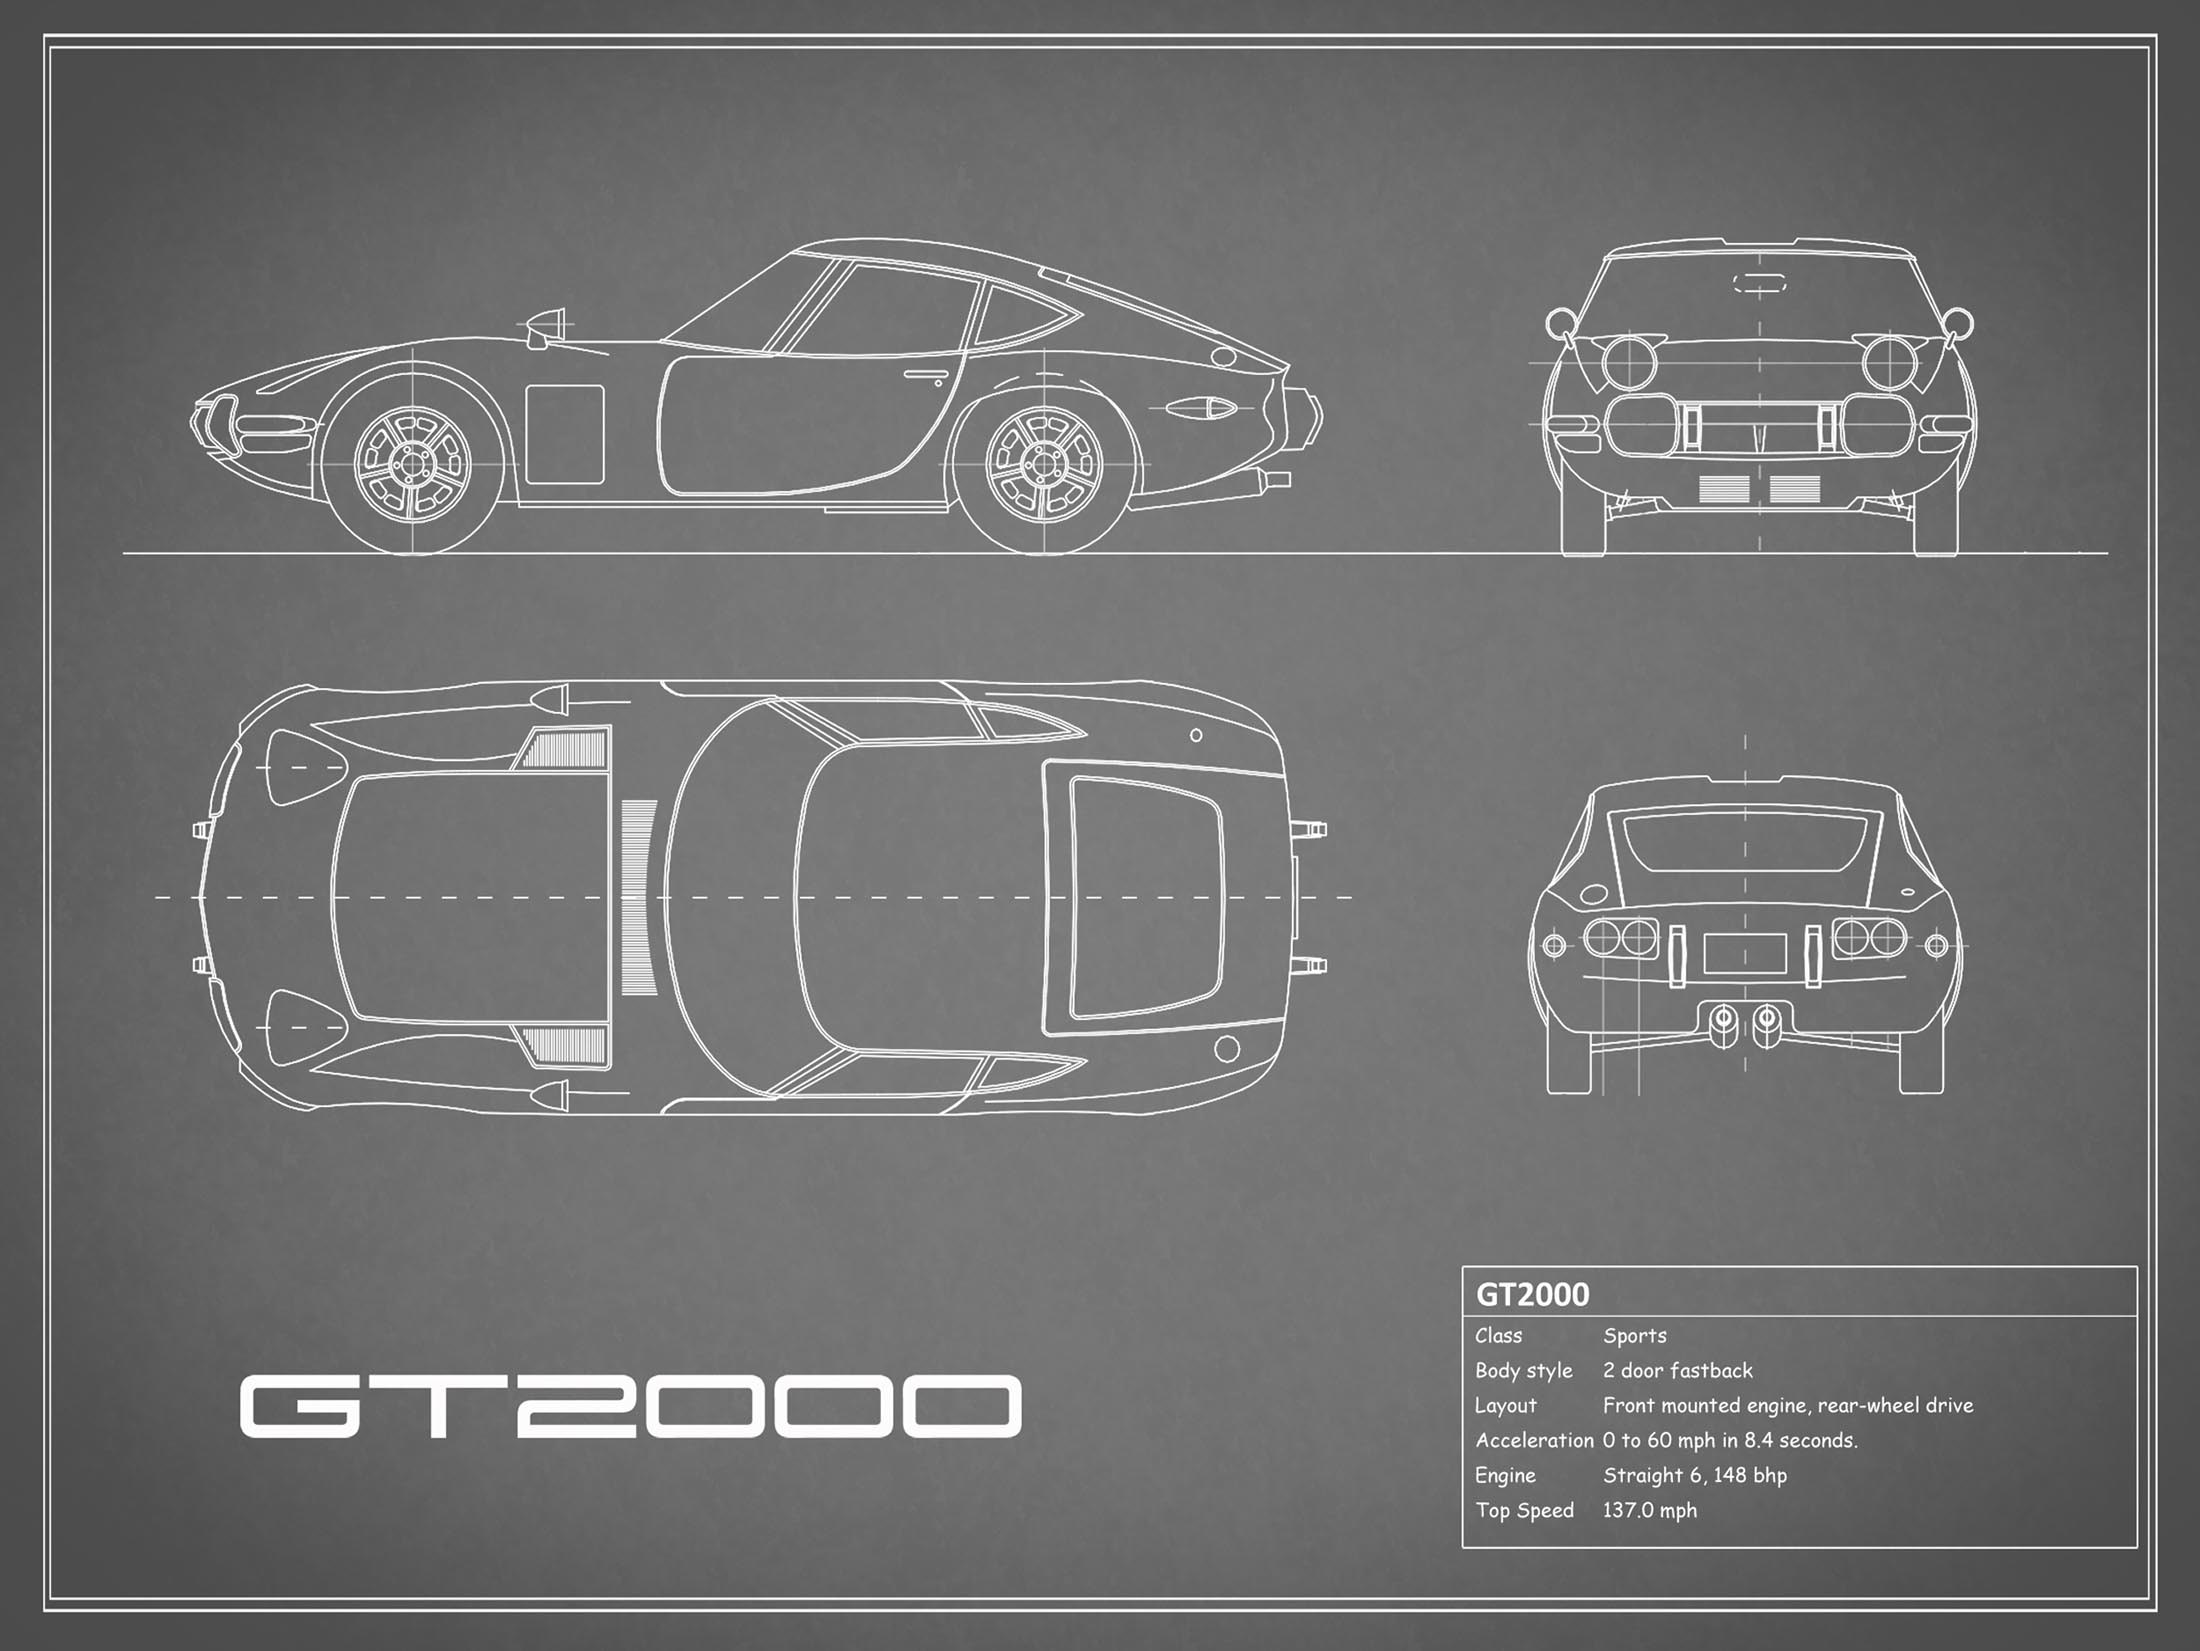 Toyota GT2000 - Gray